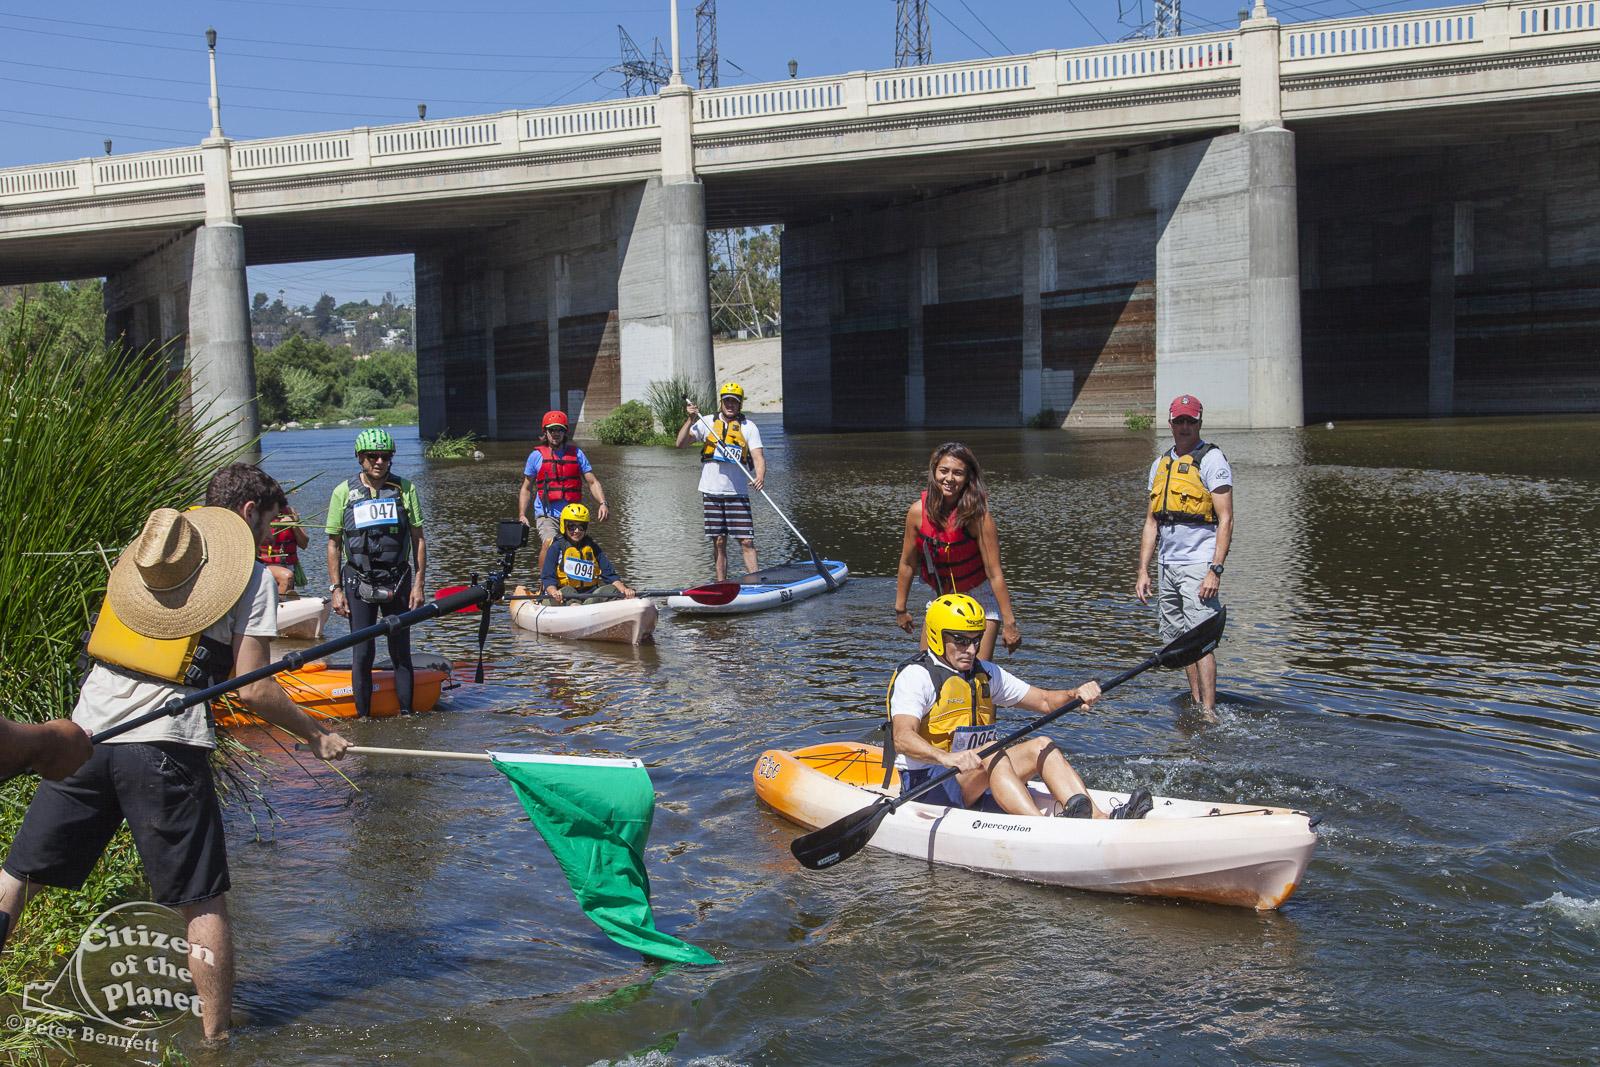 US_CA_48_3866_la_river_boat_race.jpg